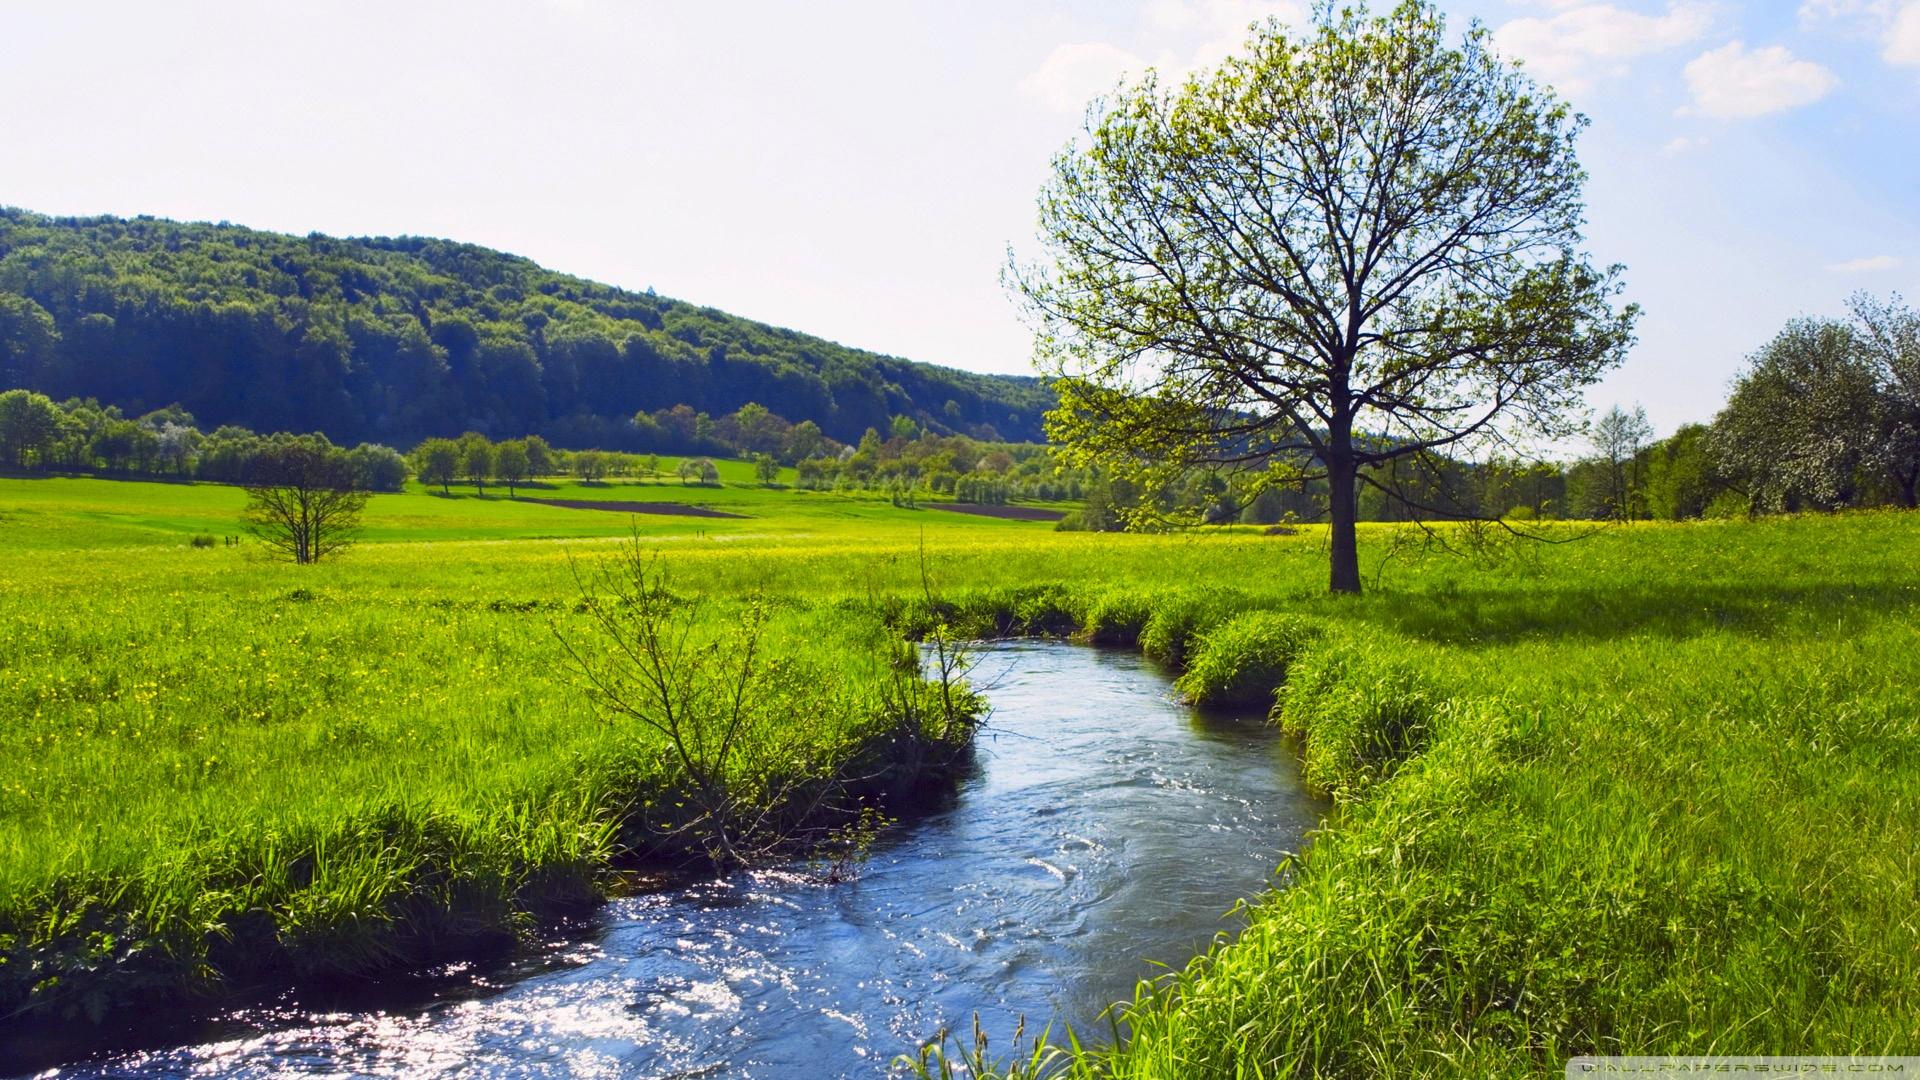 summer landscape image wallpaper - photo #20